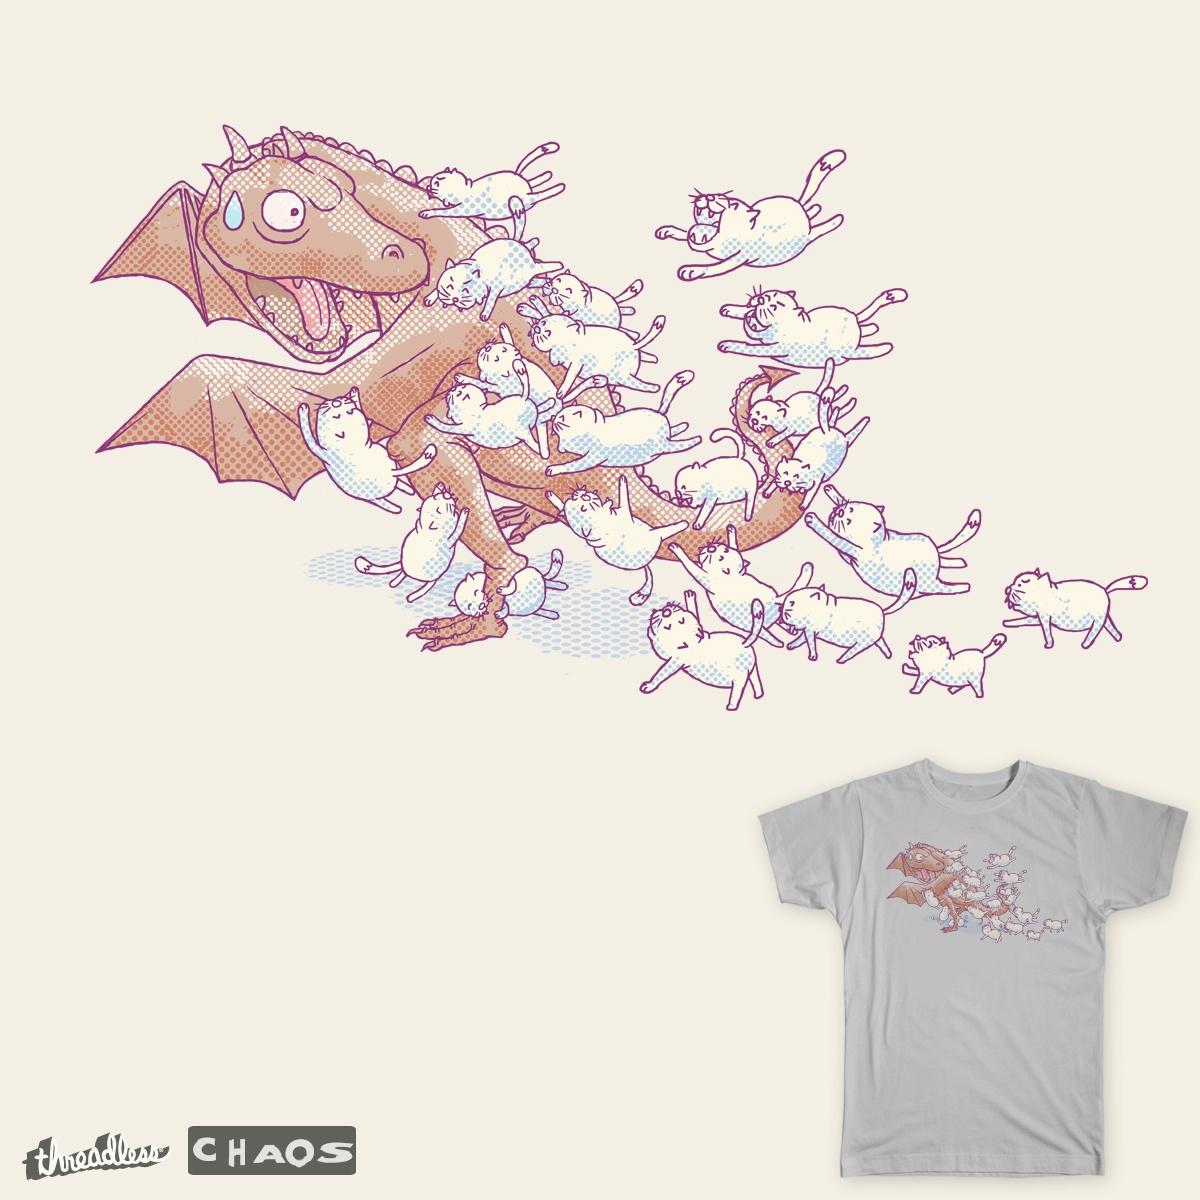 cute is a chaos by makapa on Threadless